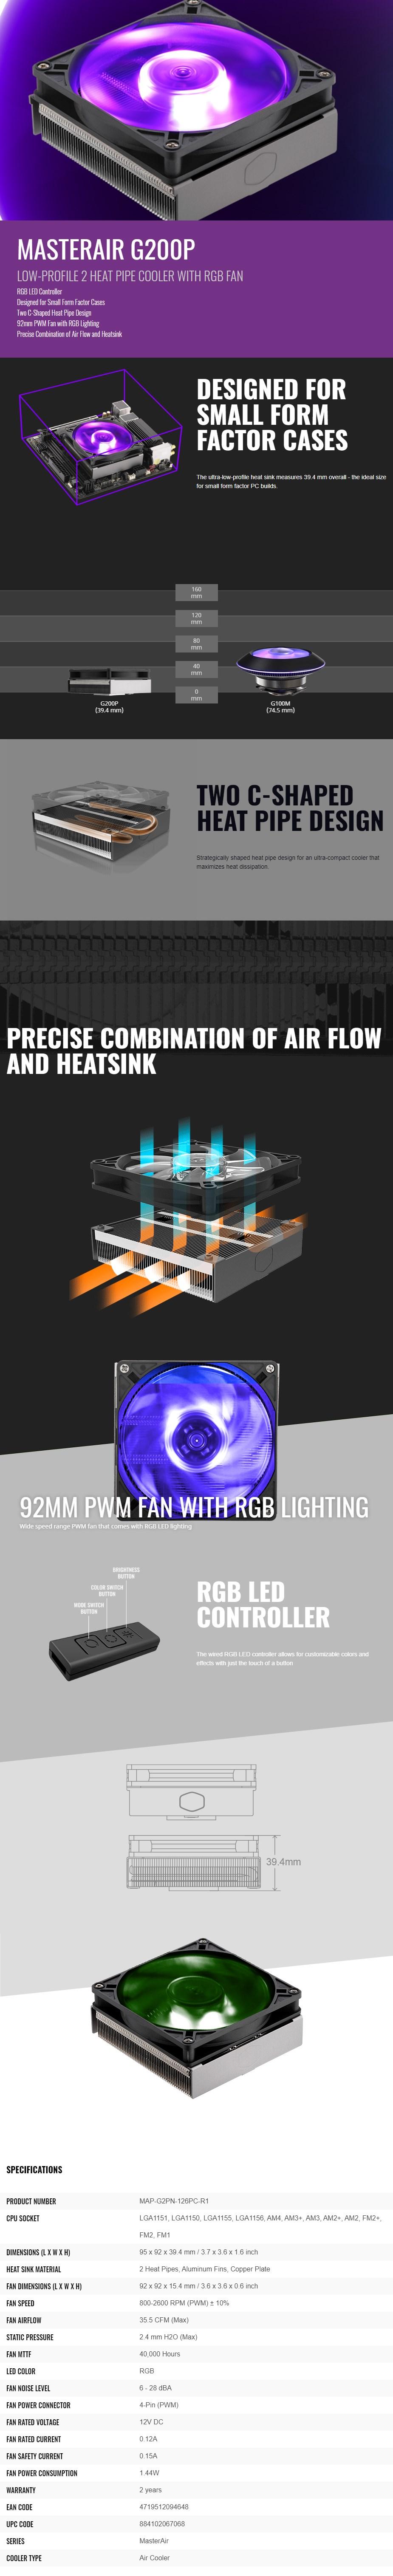 Cooler Master MasterAir G200P RGB CPU Cooler - Overview 1